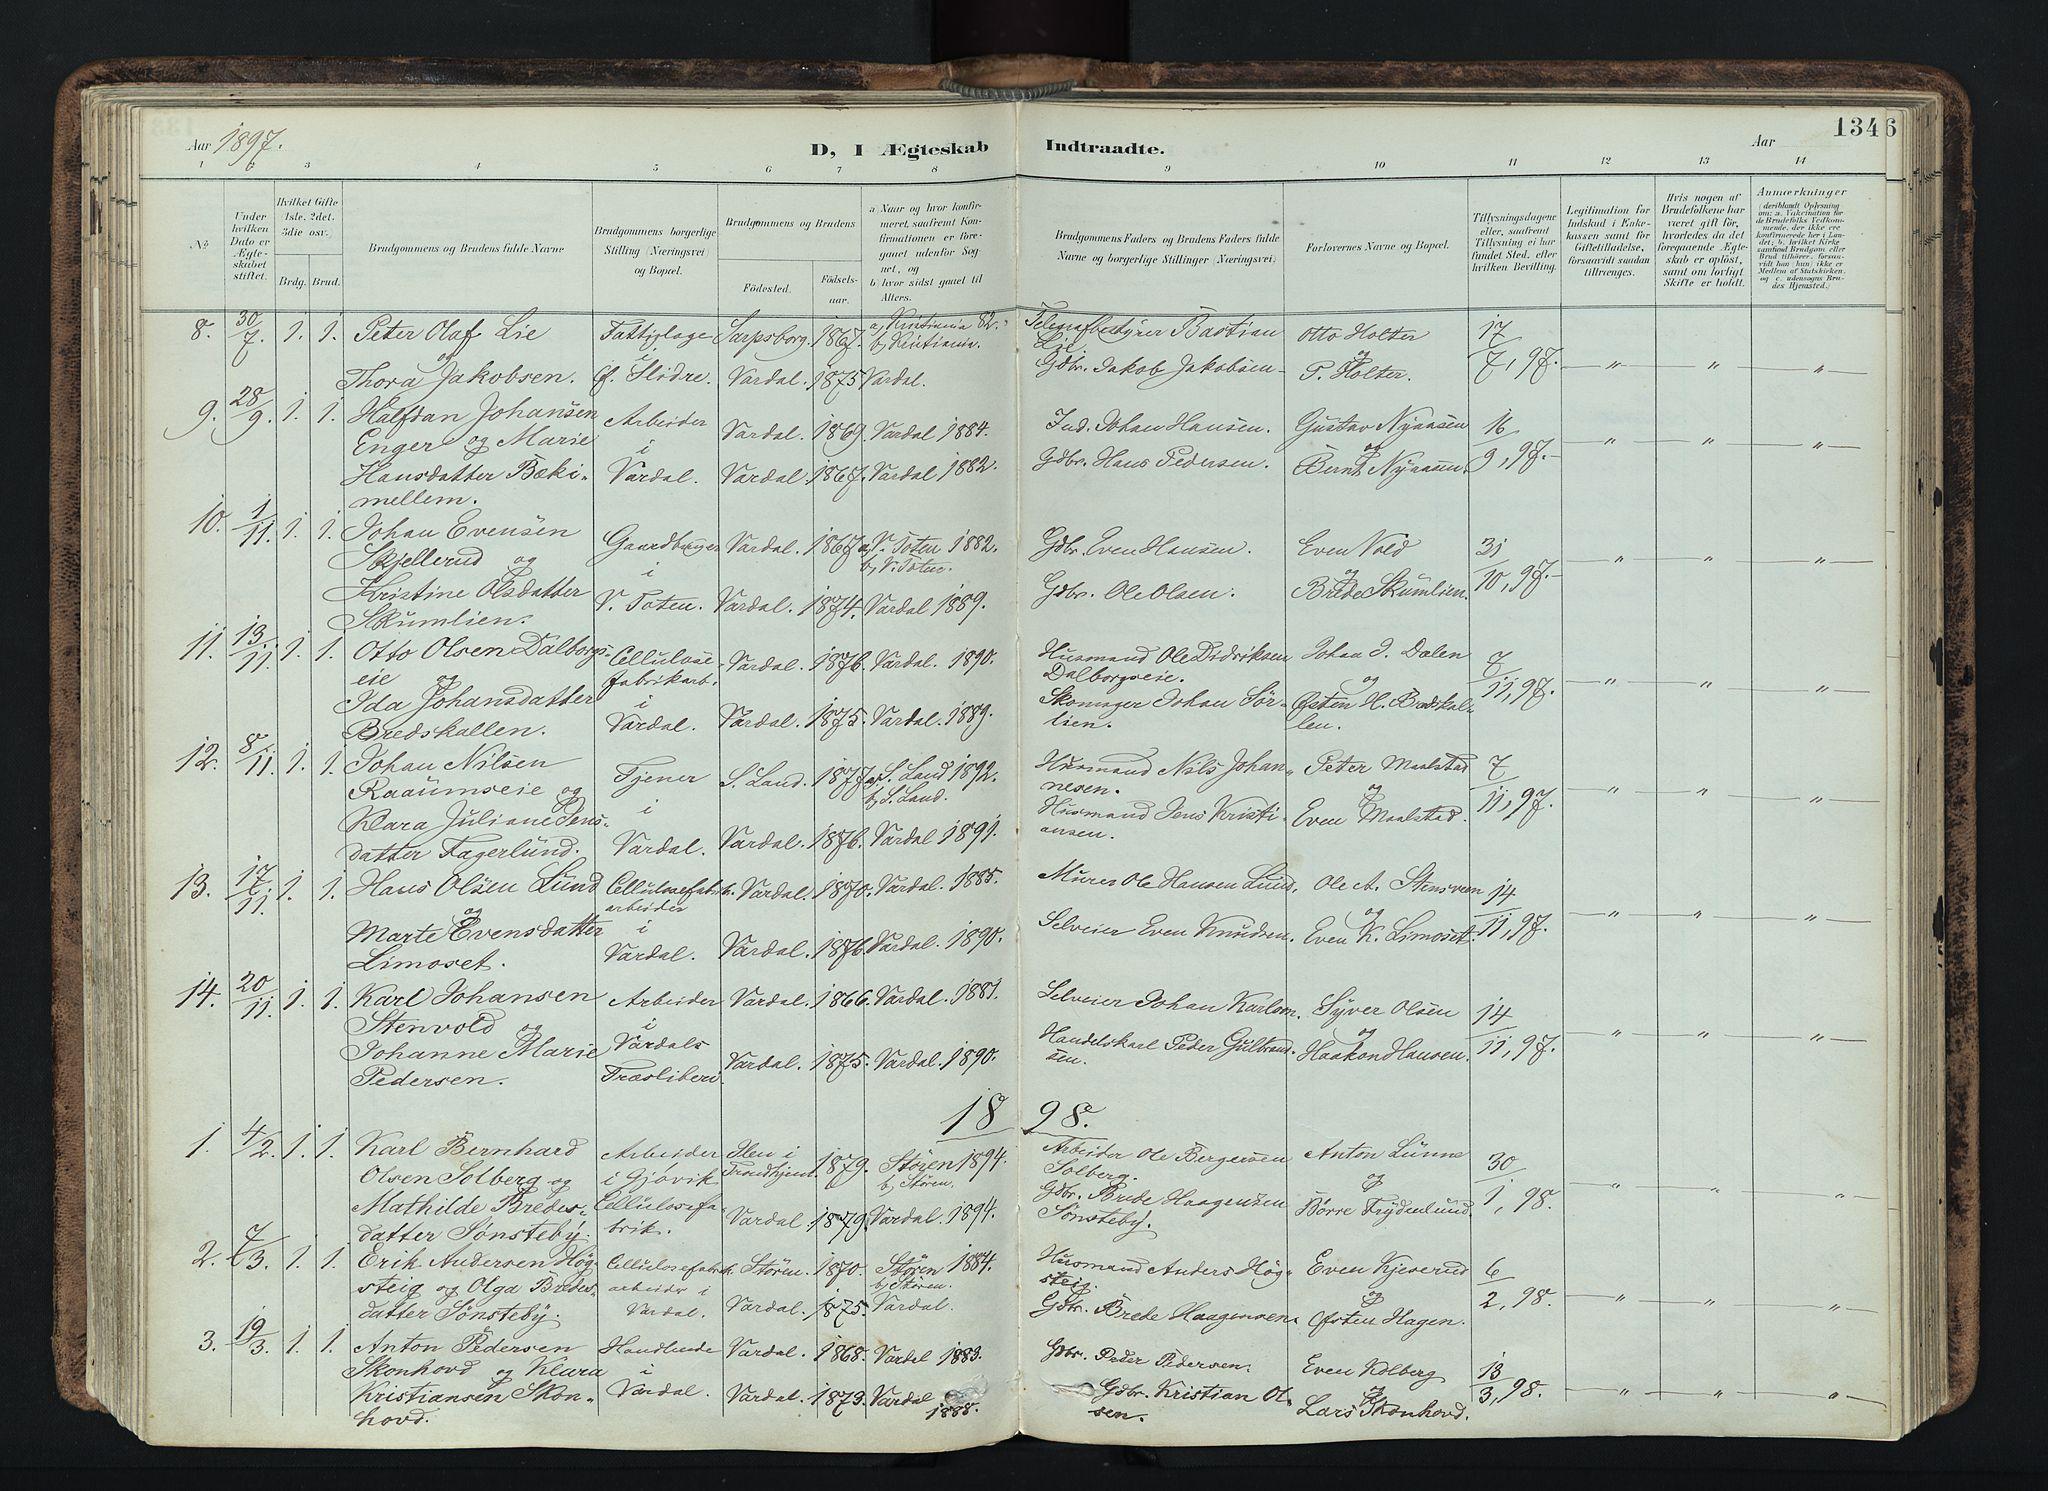 SAH, Vardal prestekontor, H/Ha/Haa/L0019: Ministerialbok nr. 19, 1893-1907, s. 134